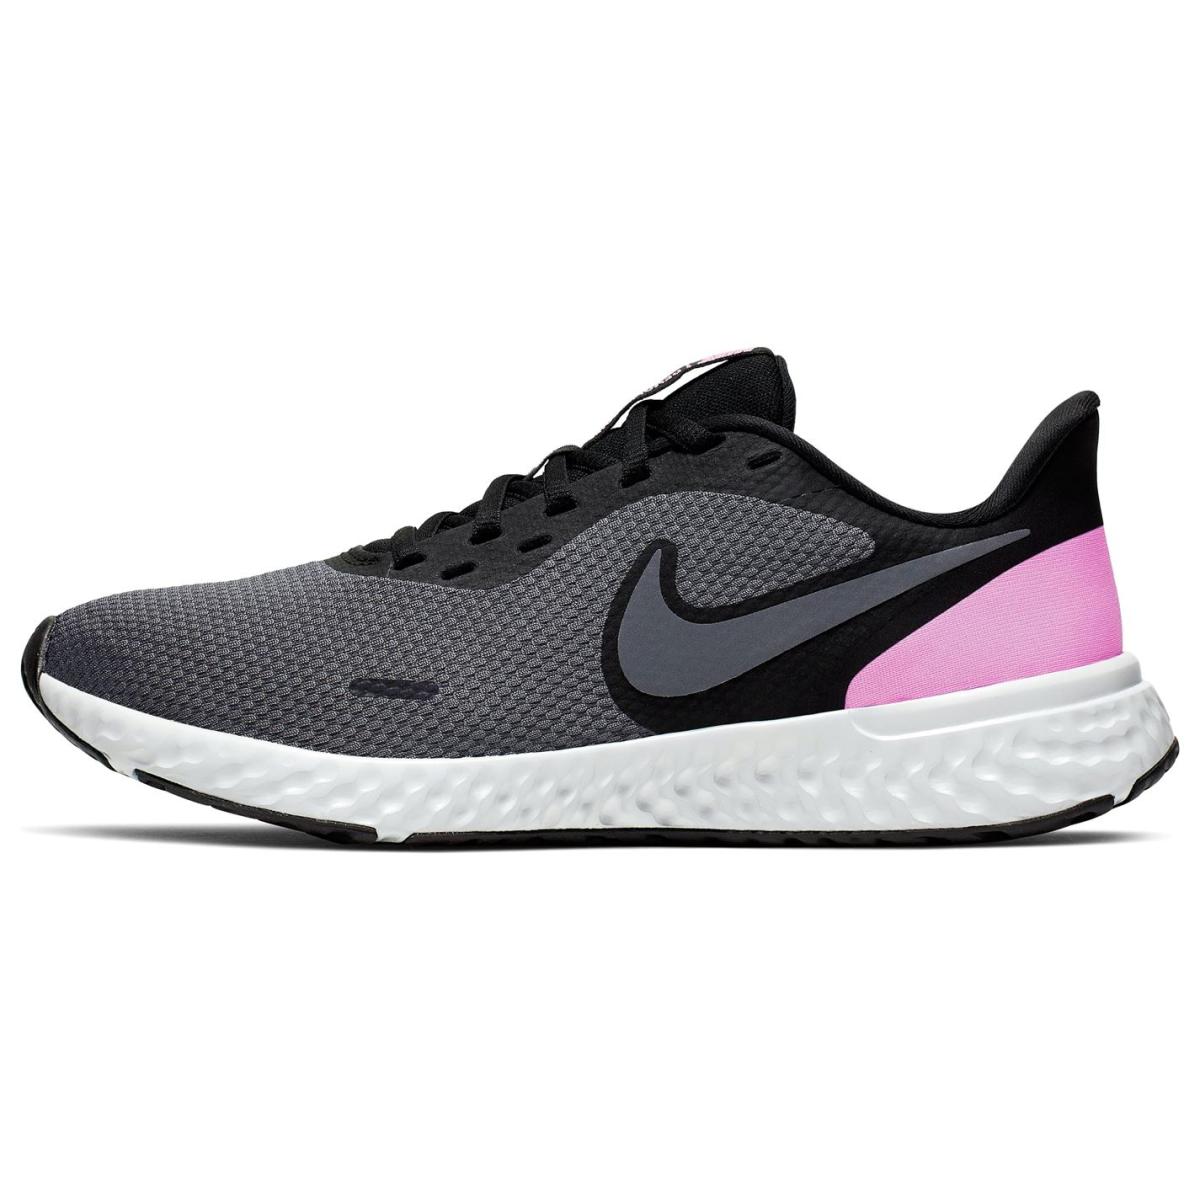 Nike-Revolution-Turnschuhe-Damen-Sneaker-Sportschuhe-Laufschuhe-1160 Indexbild 12